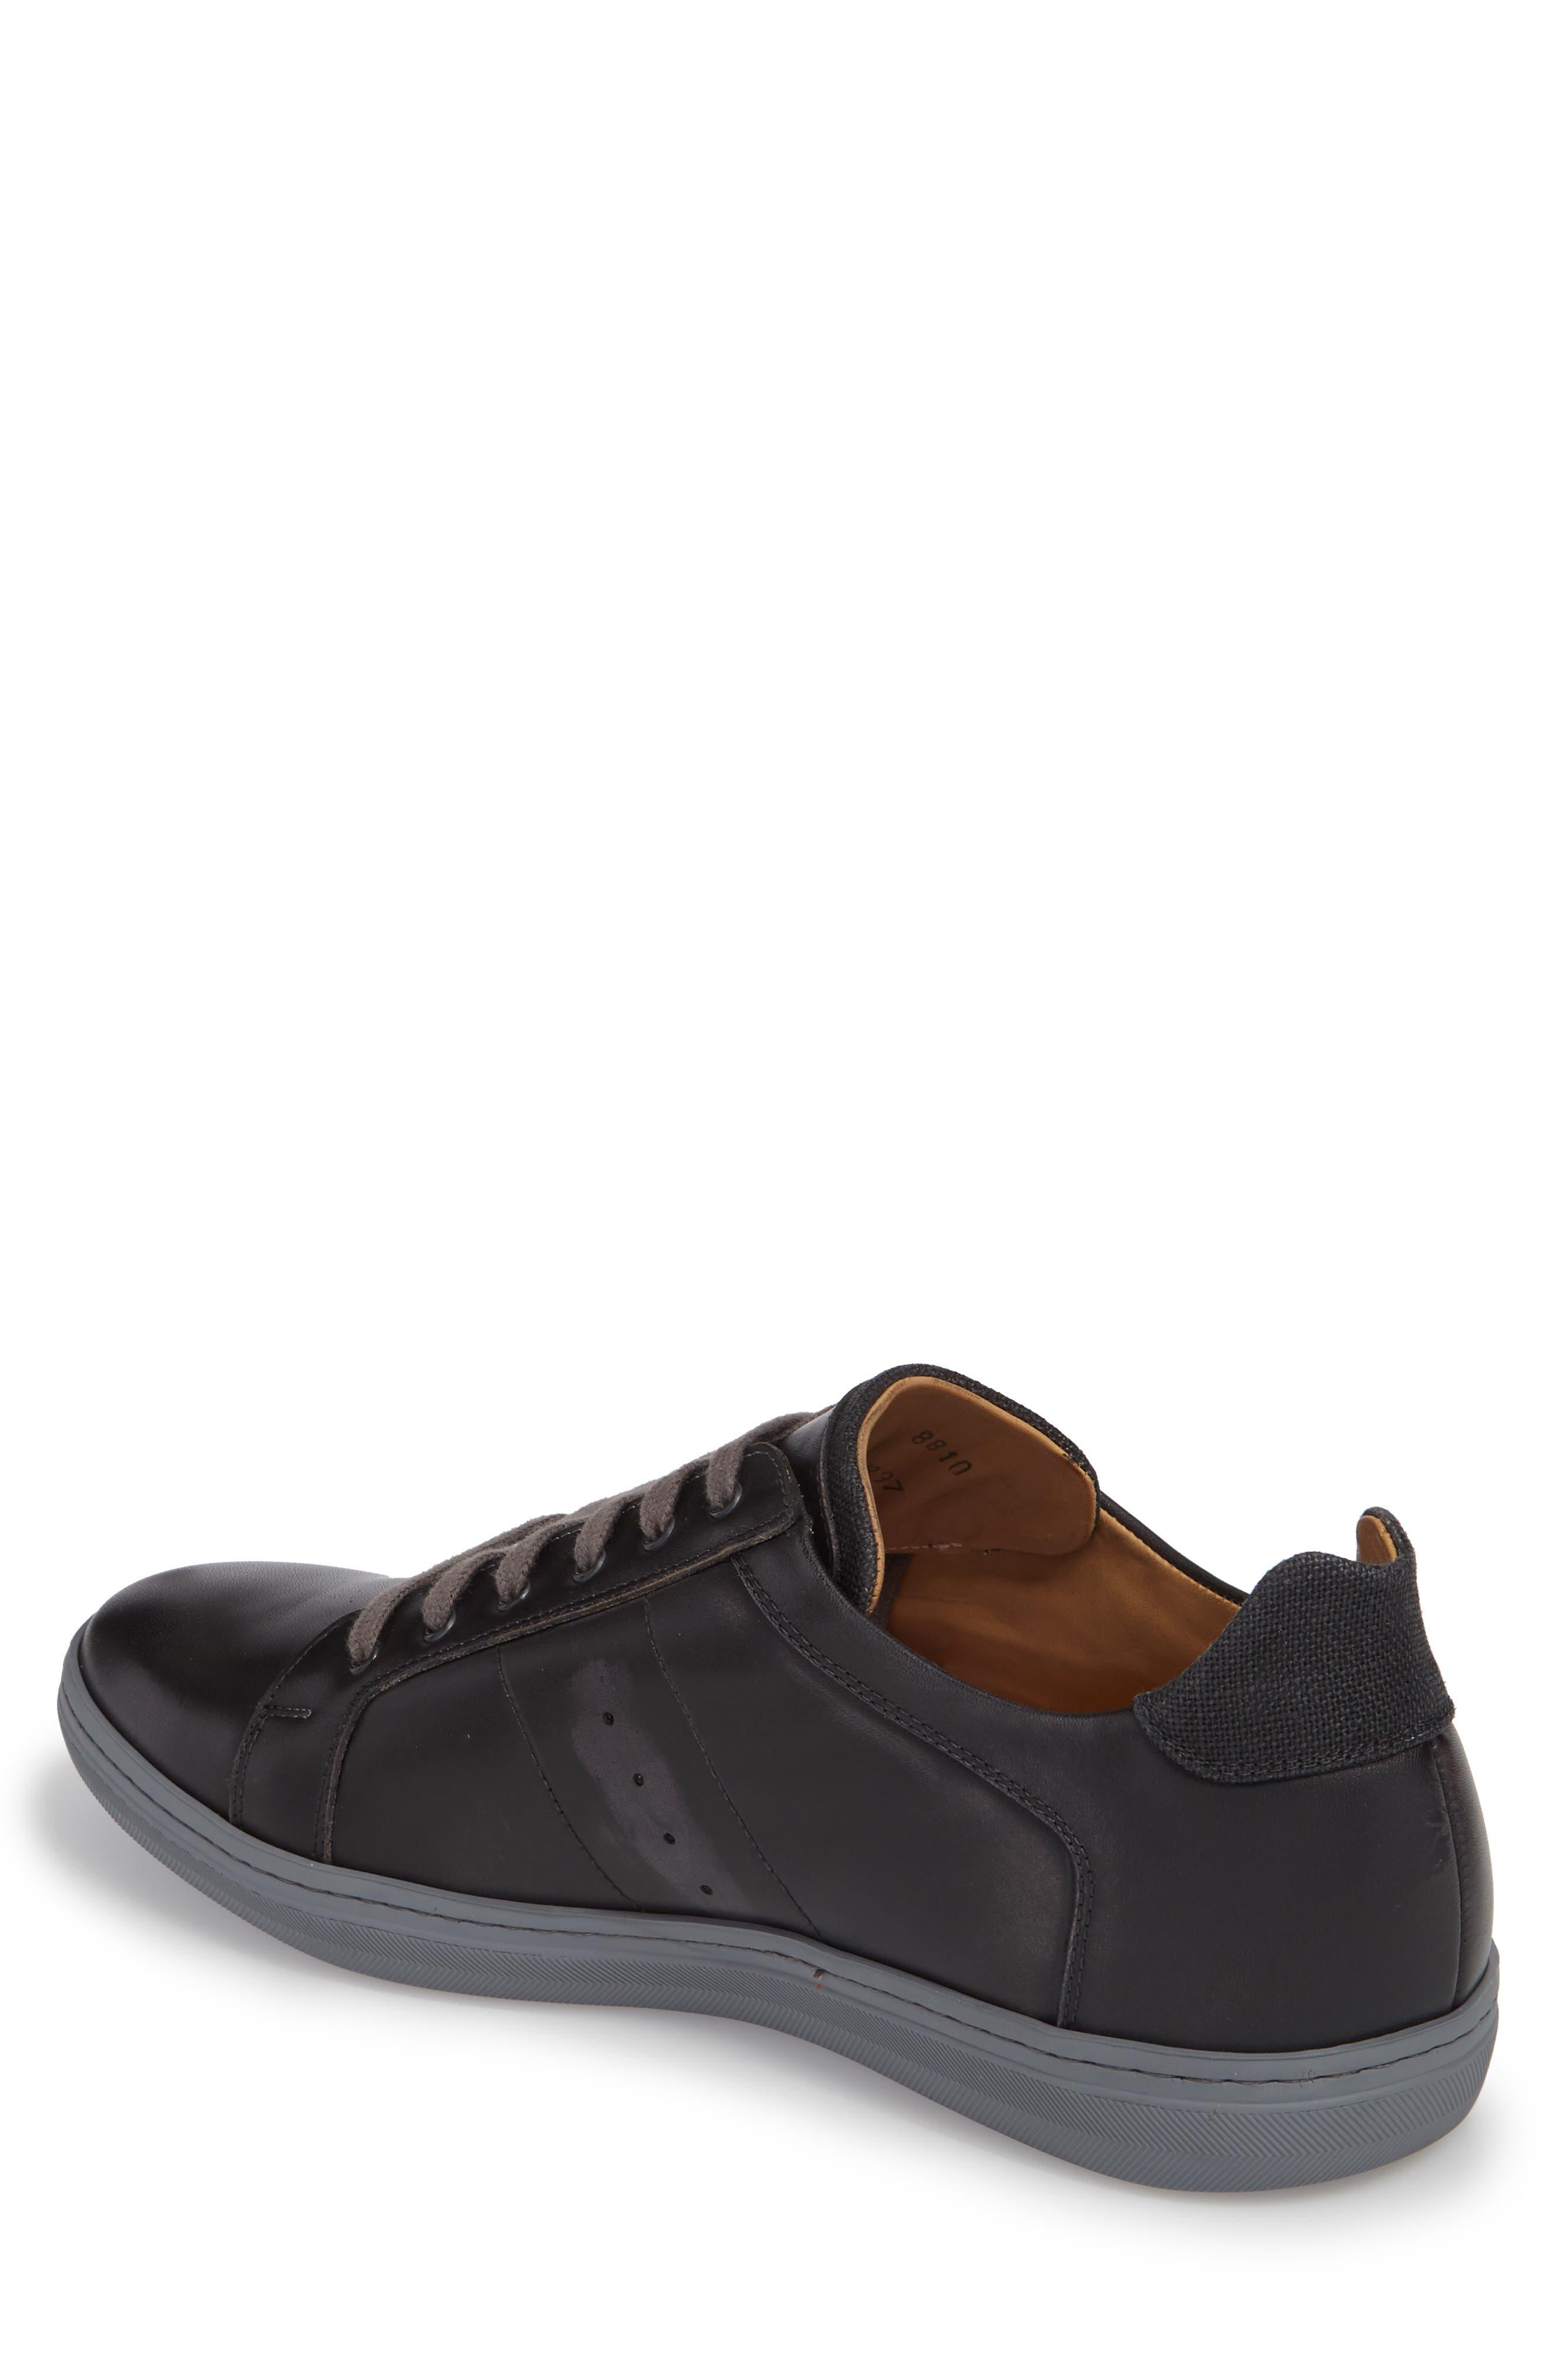 Cuzco Sneaker,                             Alternate thumbnail 2, color,                             Graphite/ Black Leather